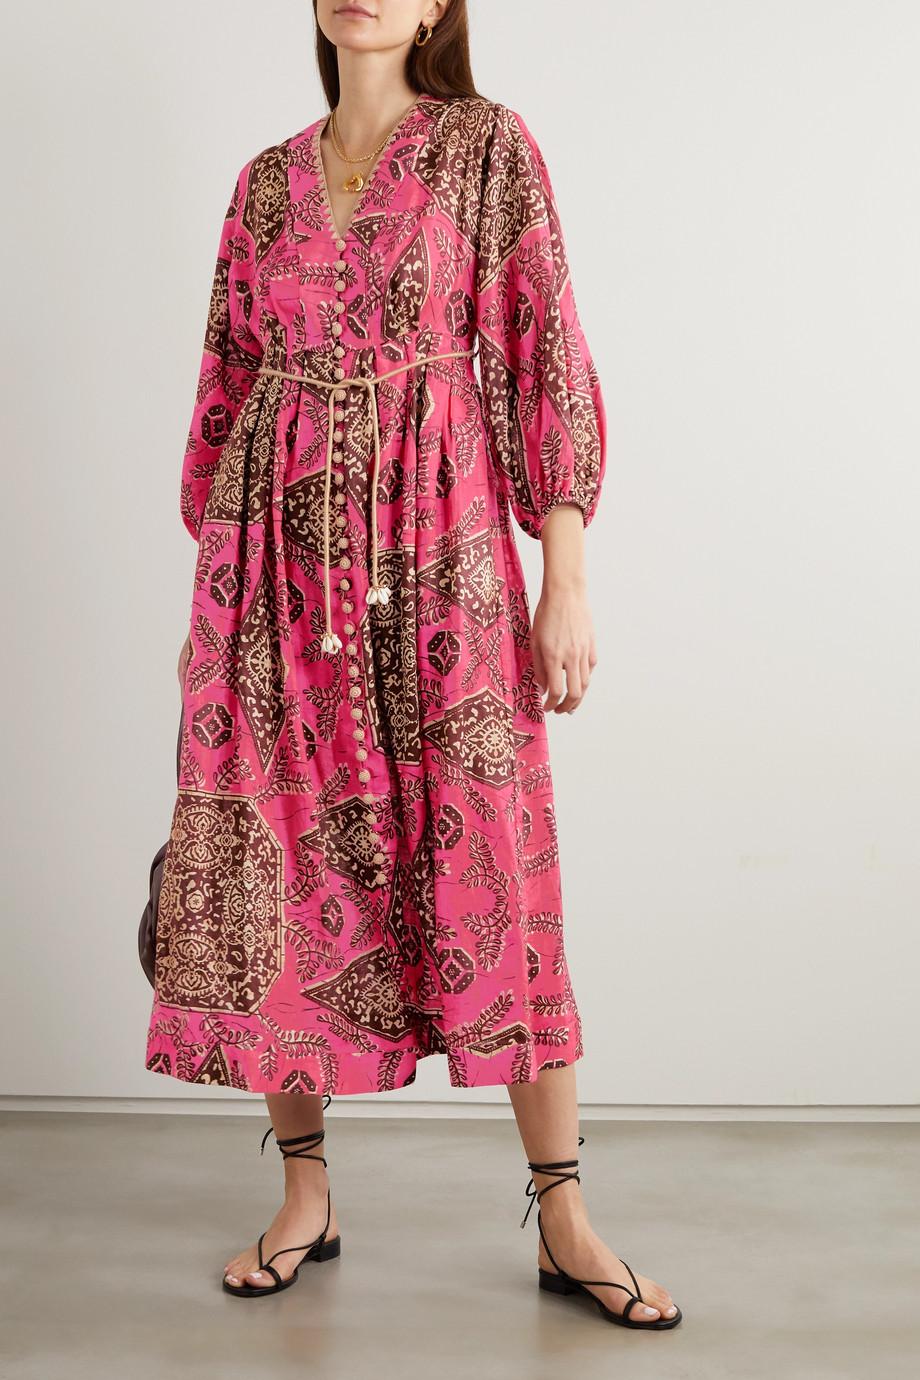 Zimmermann Lulu belted crochet-trimmed printed linen midi dress